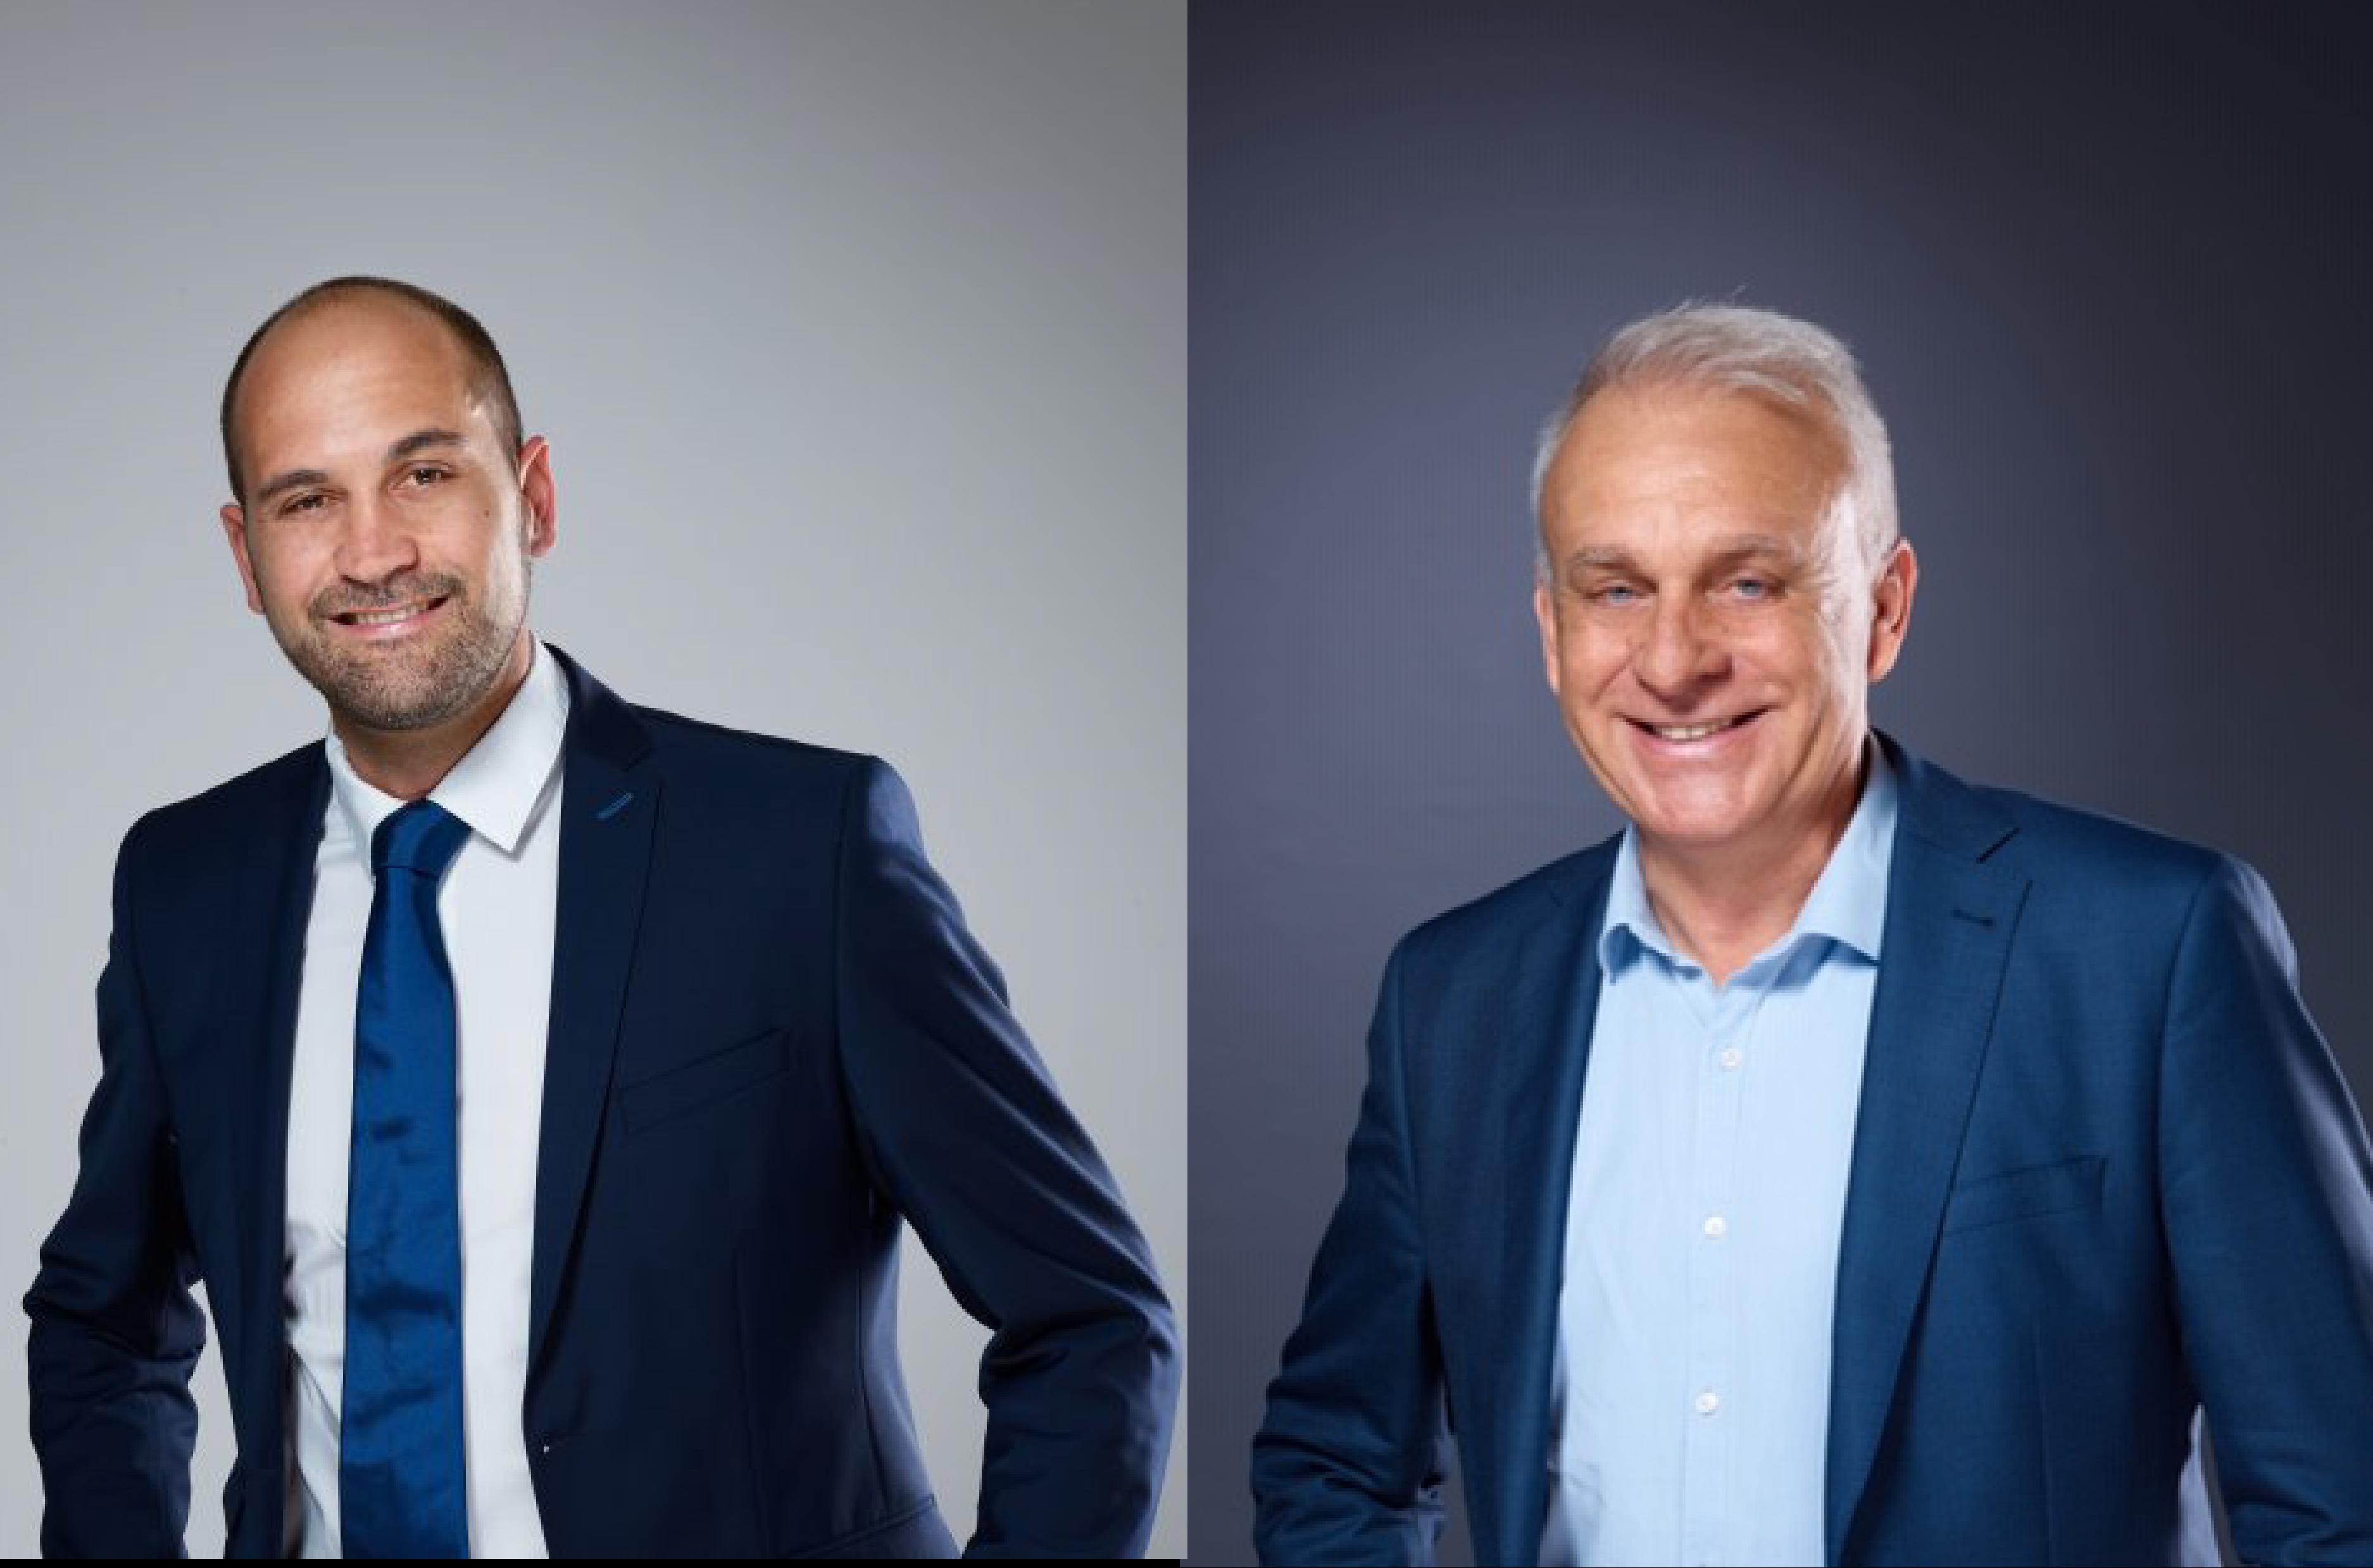 Arthur Loyd Nice : interview d'Alexandre Capony et Frédéric Gerard, dirigeants associés